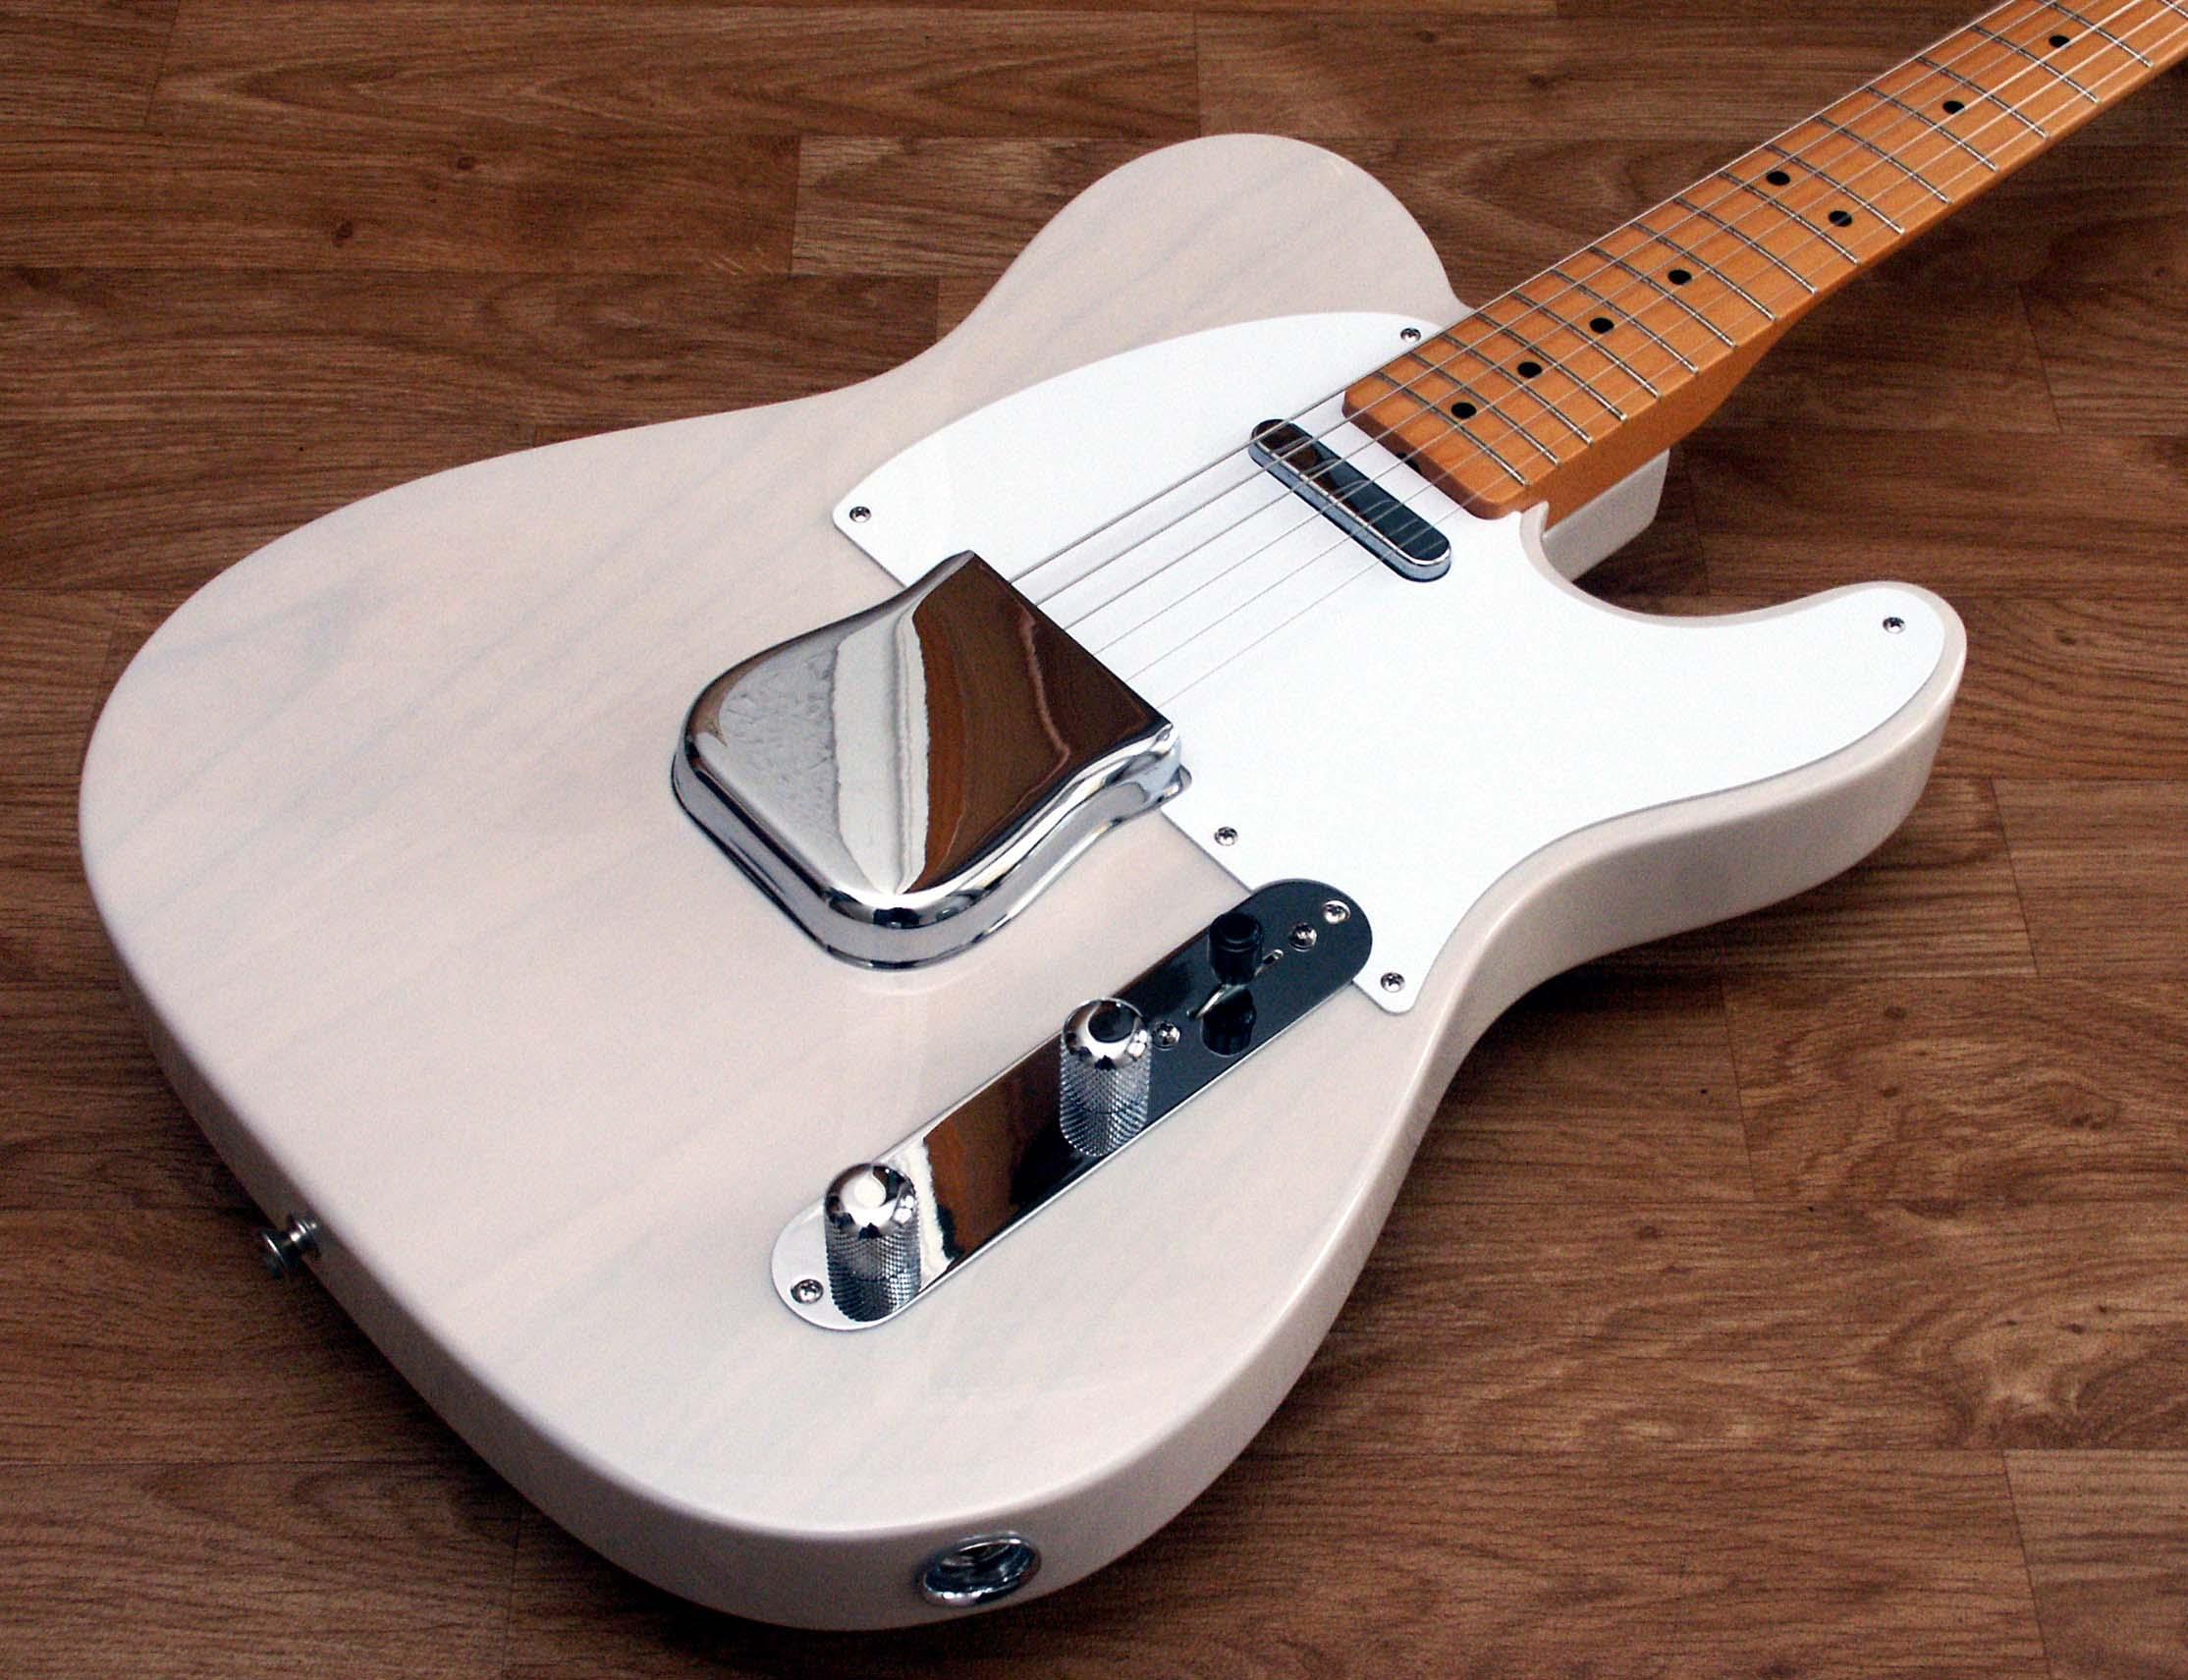 Fender Telecaster Wallpapers 2228x1711